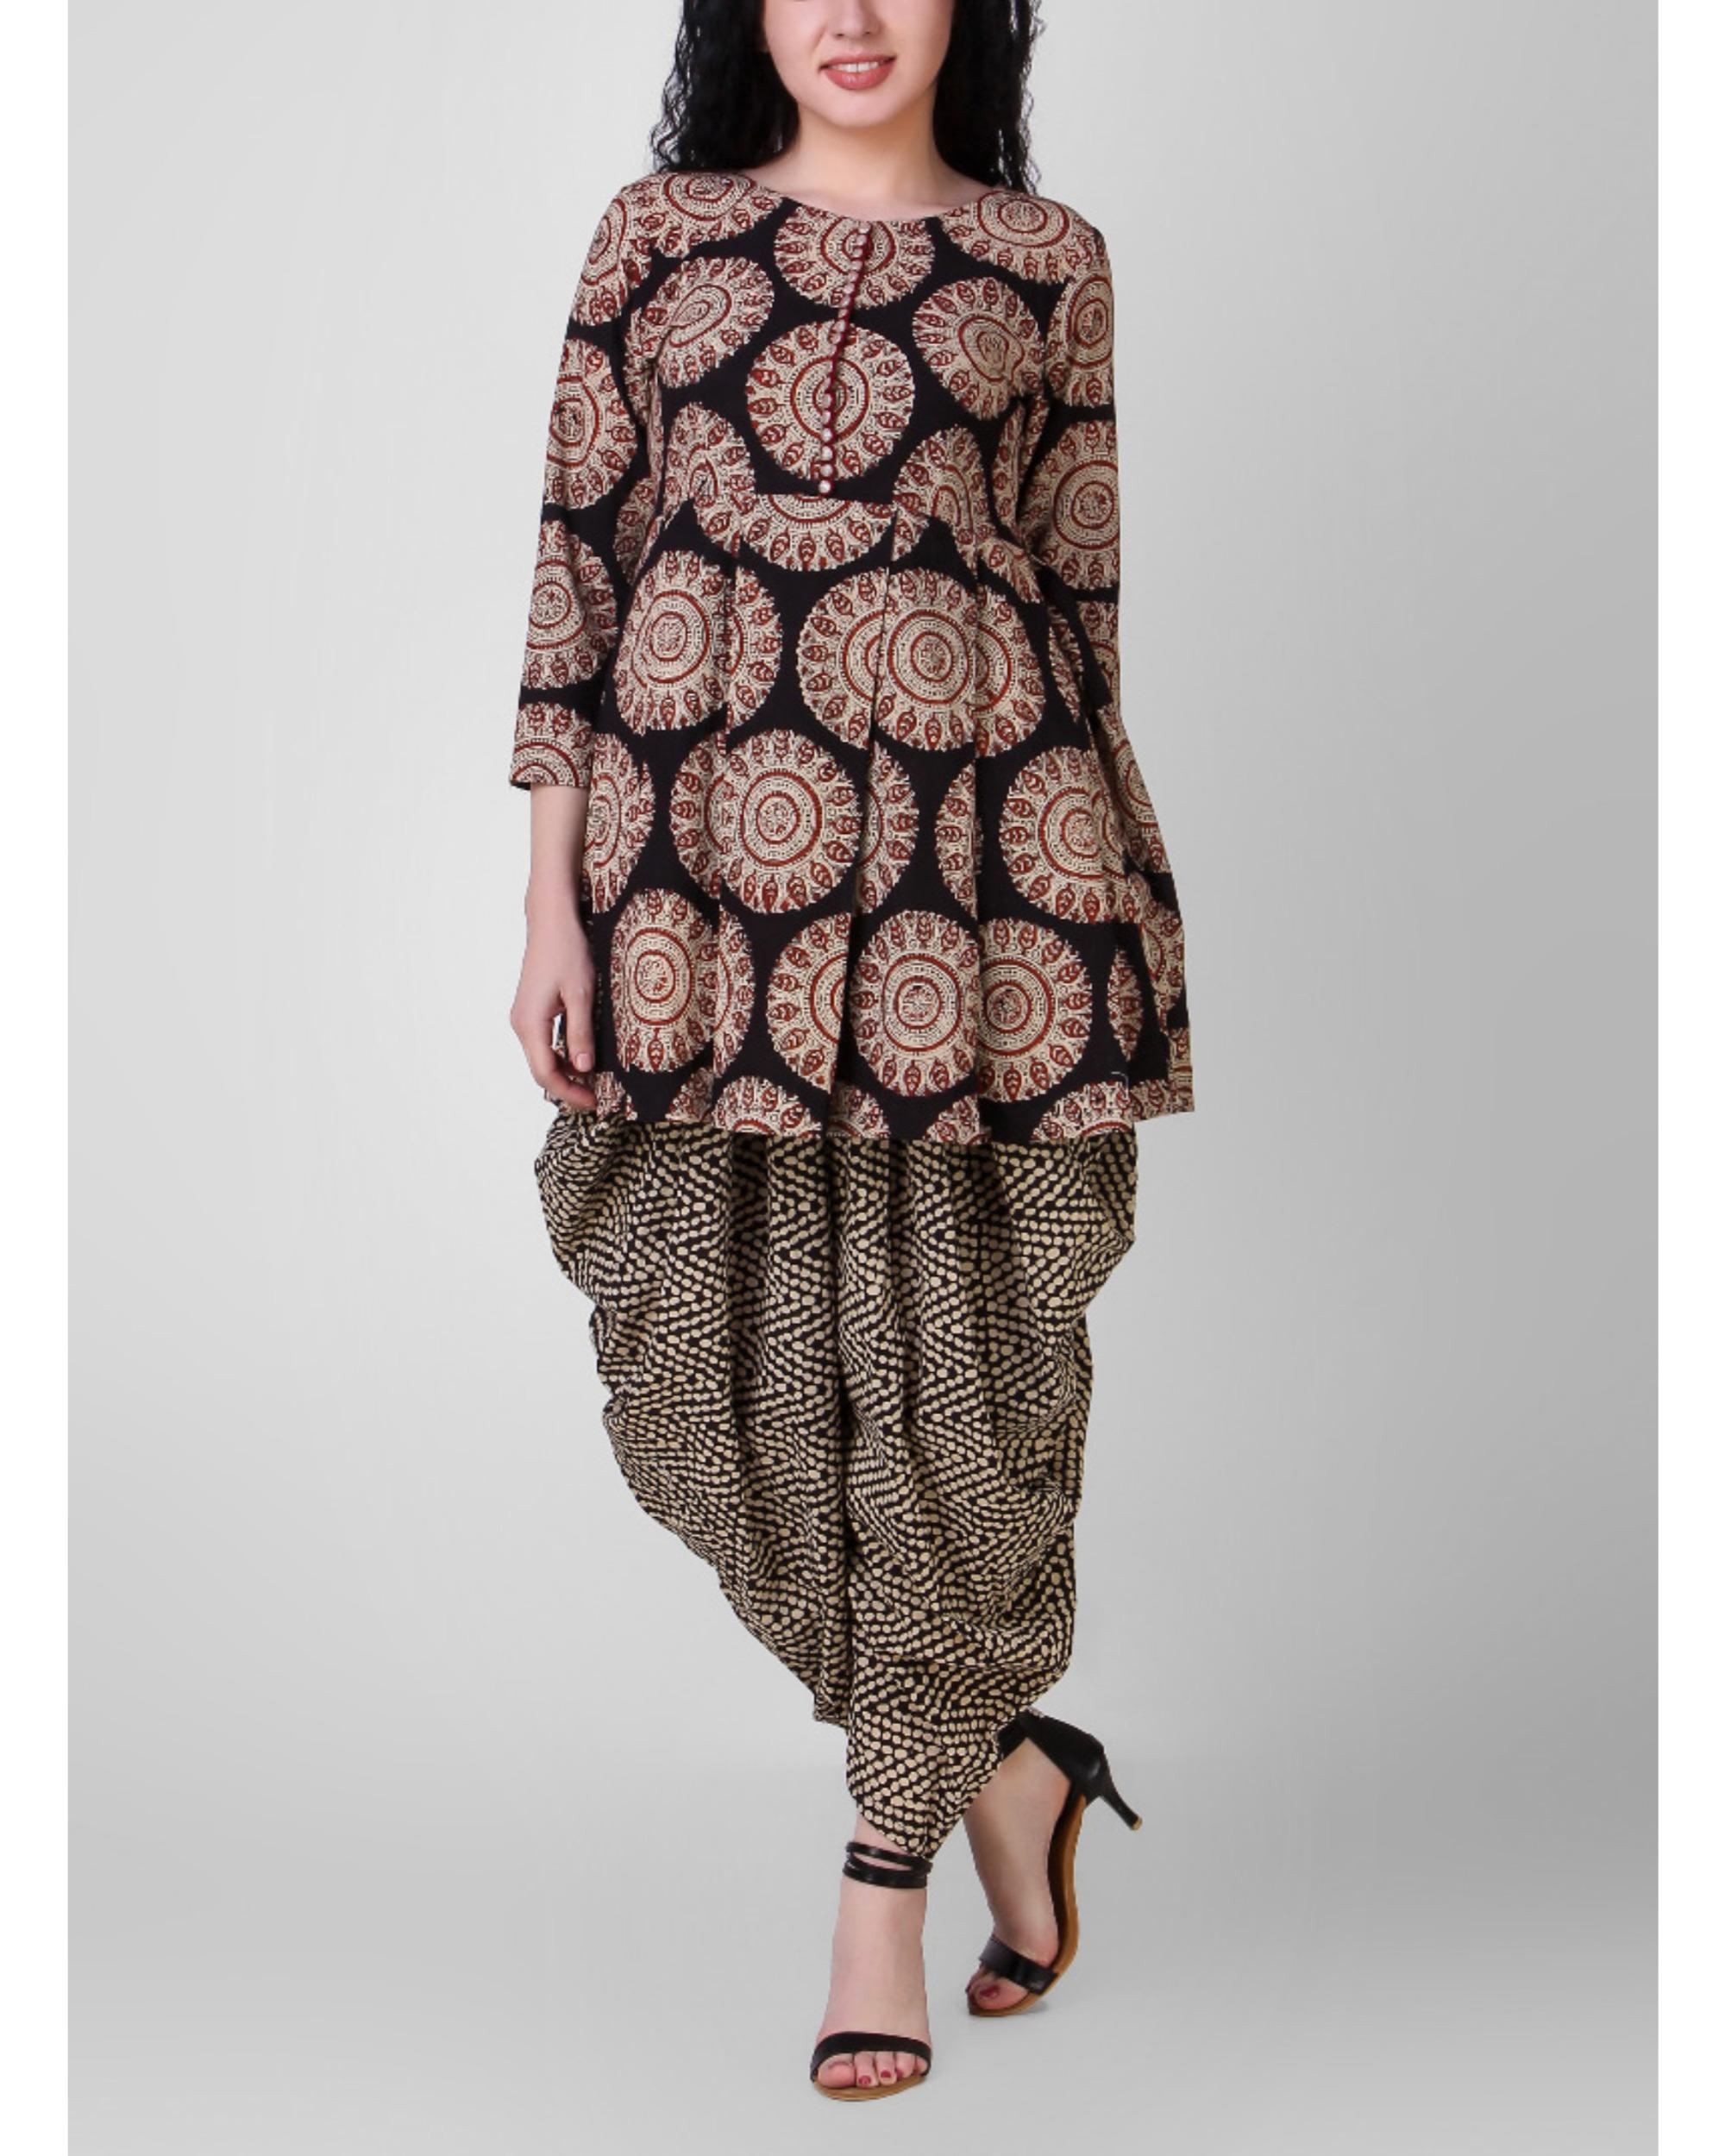 4d012756951 Black-beige kurta with dhoti pants by Simply Kitsch